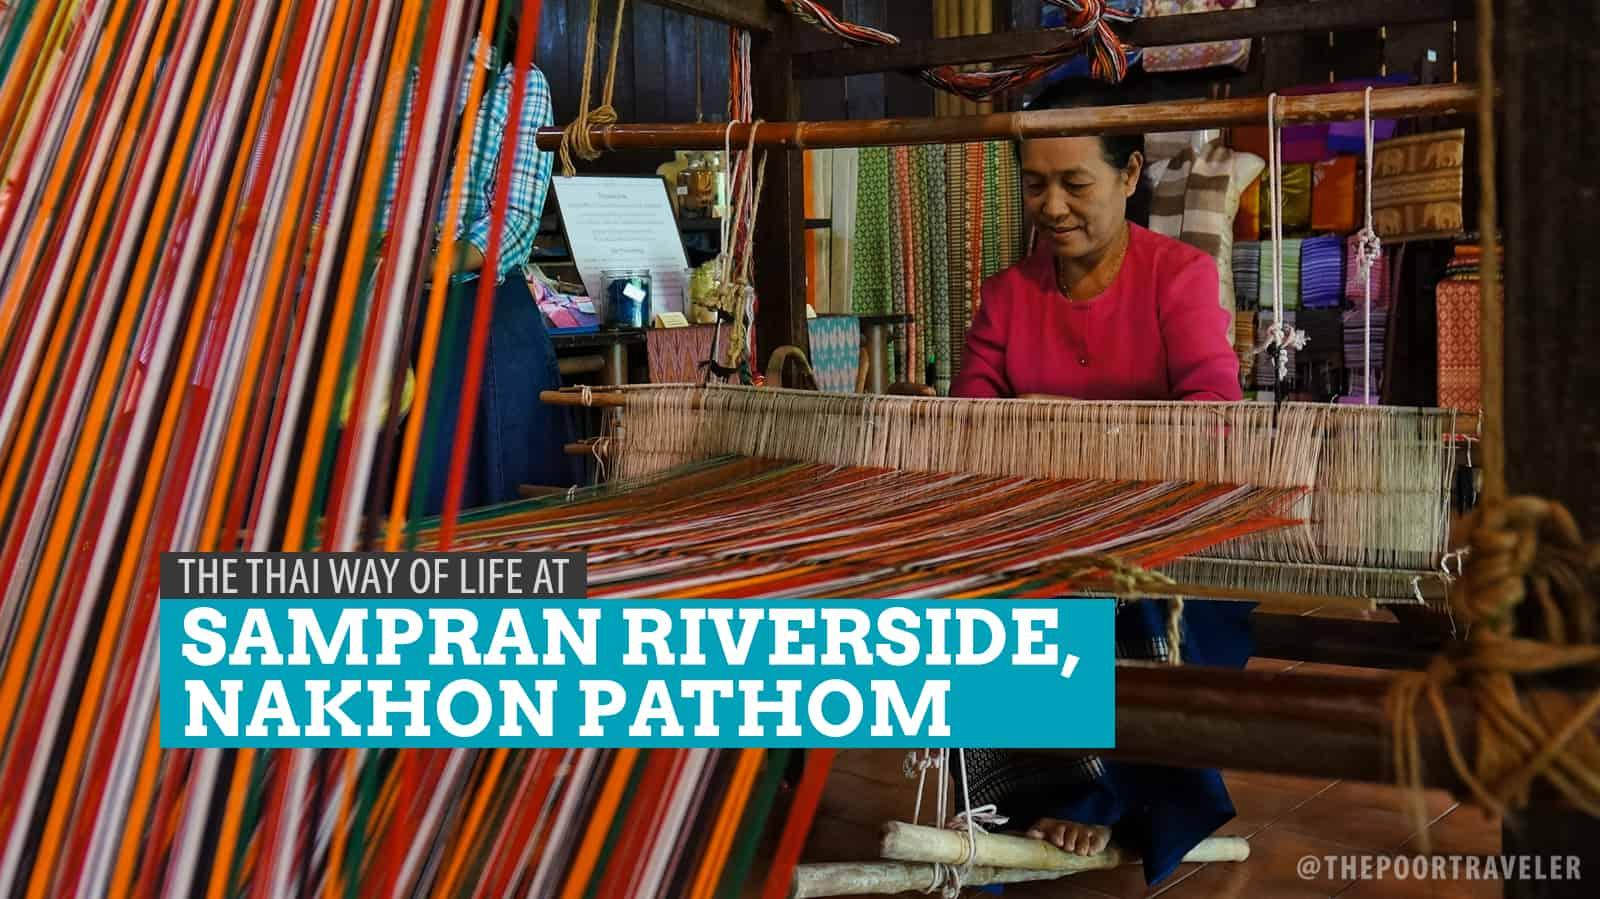 The Sampran Riverside Way of Life in Nakhon Pathom, Thailand